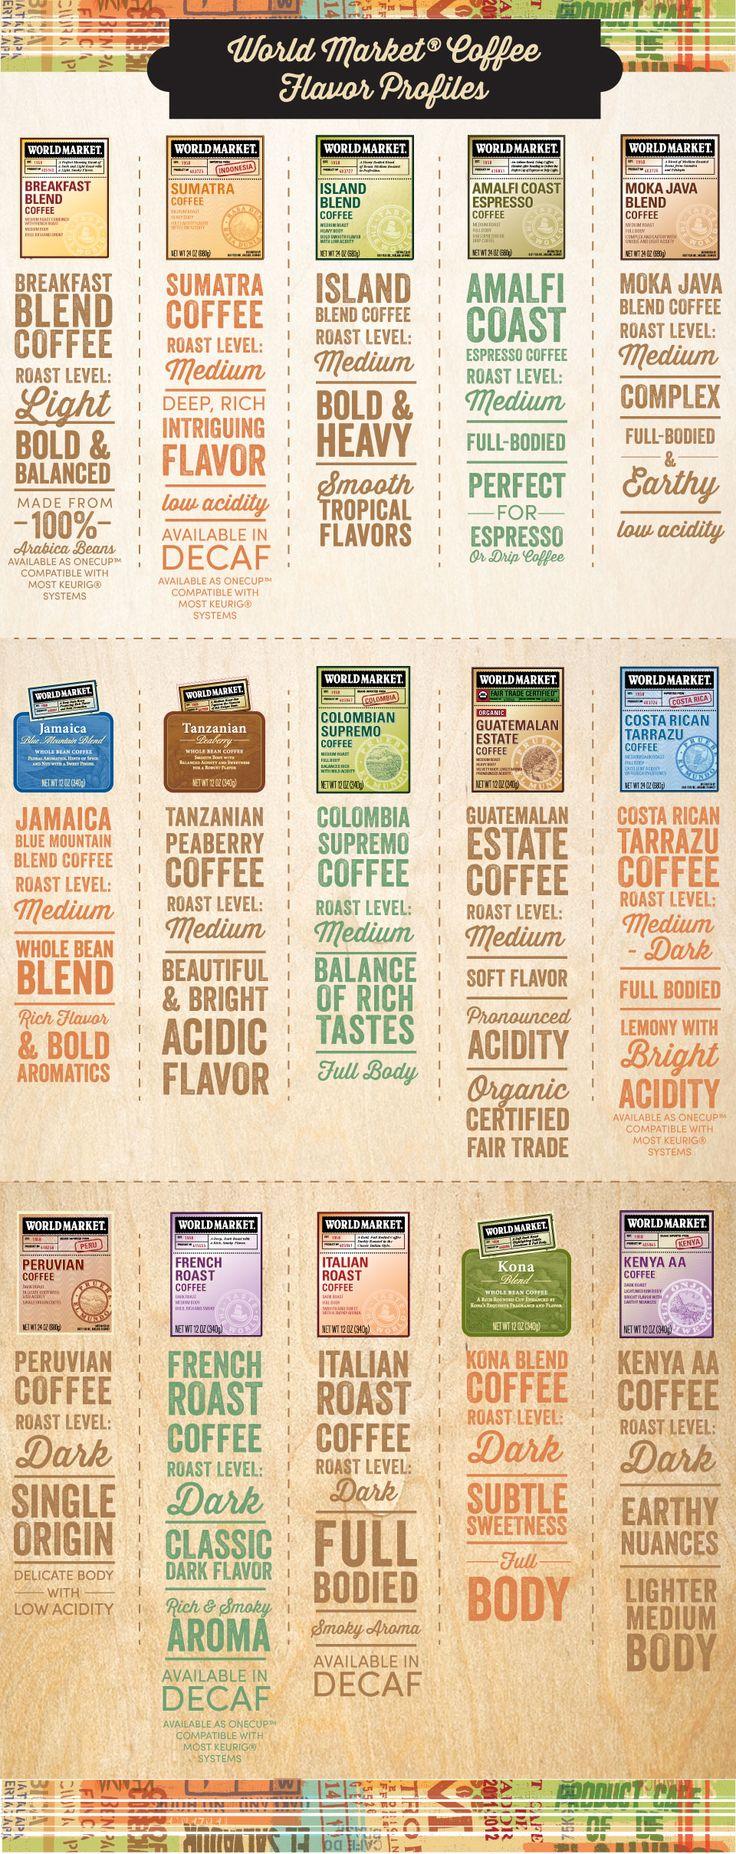 World Market Coffee Flavor Profiles